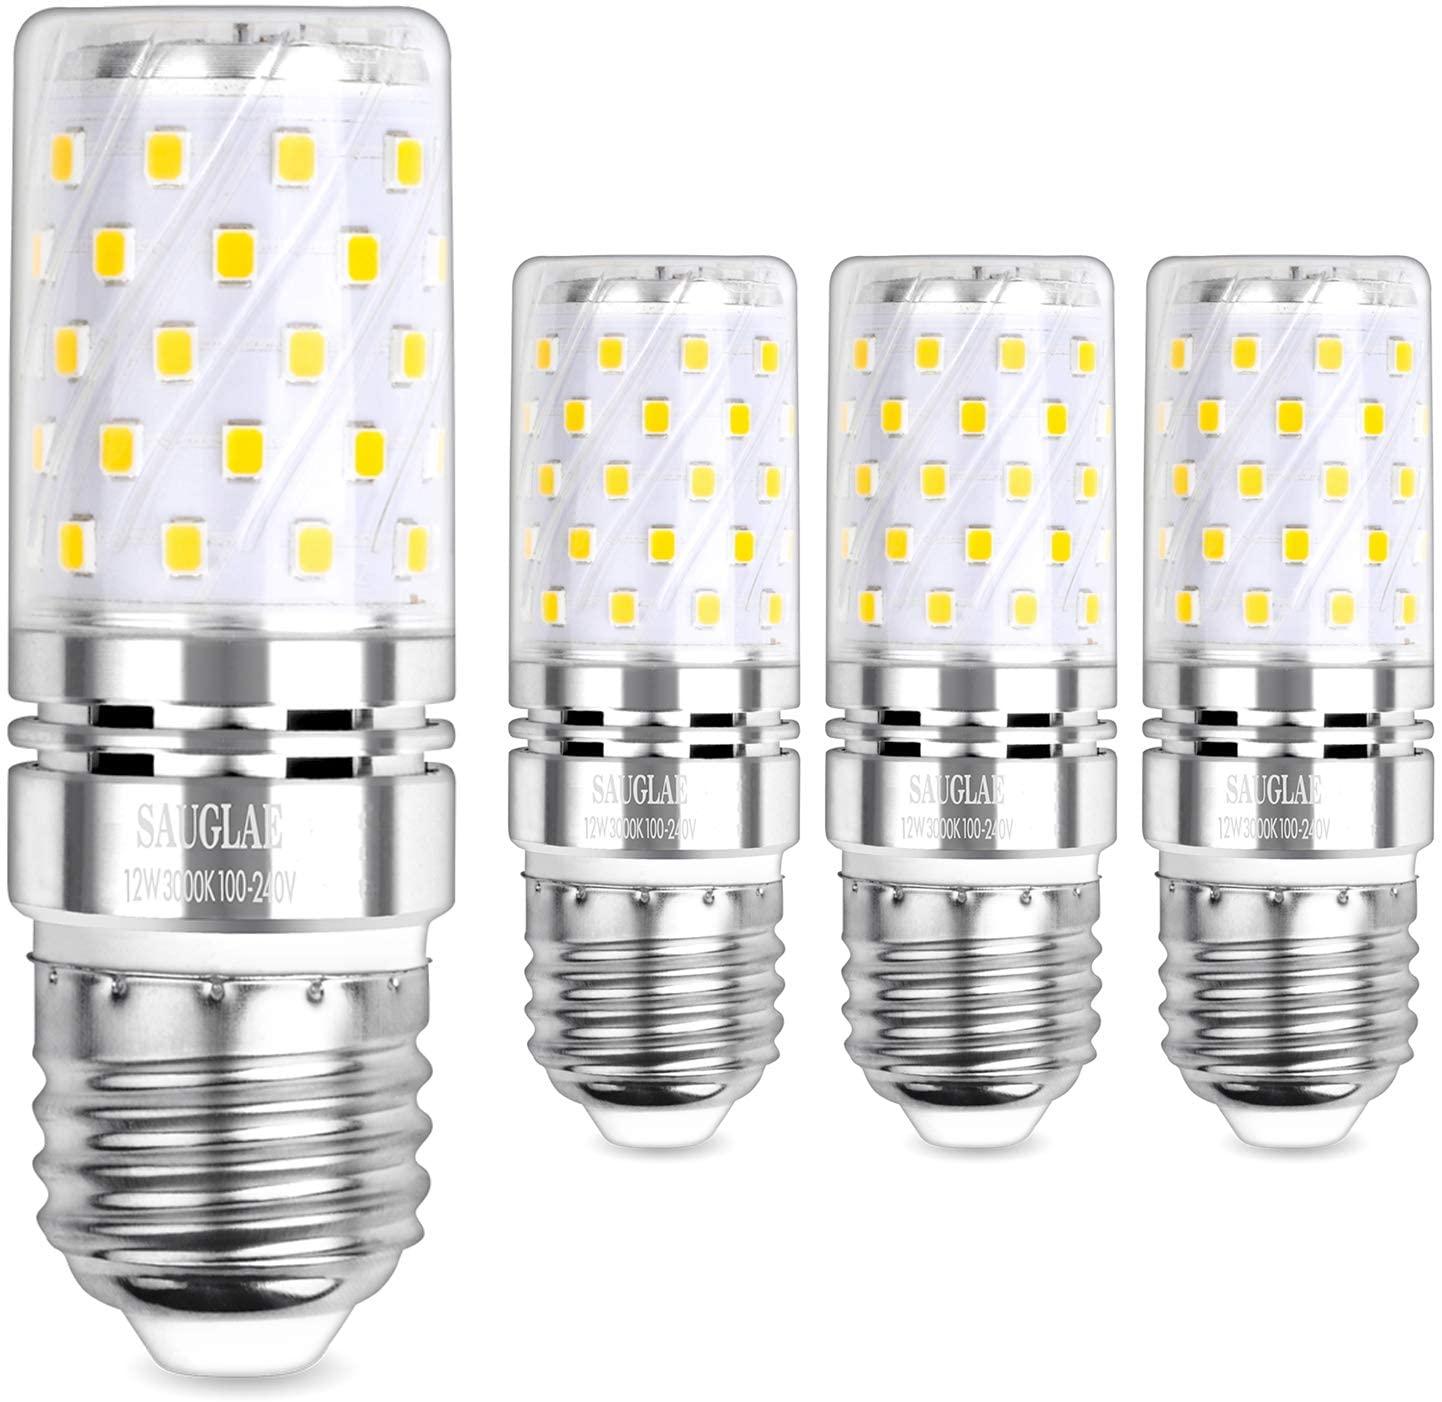 Sagel E26 LED Corn Bulbs 12W, 100W Incandescent Bulbs Equivalent, 3000K Warm White, Non-Dimmable, 1200Lm, Edison Screw Corn Light Bulbs, 4-Pack